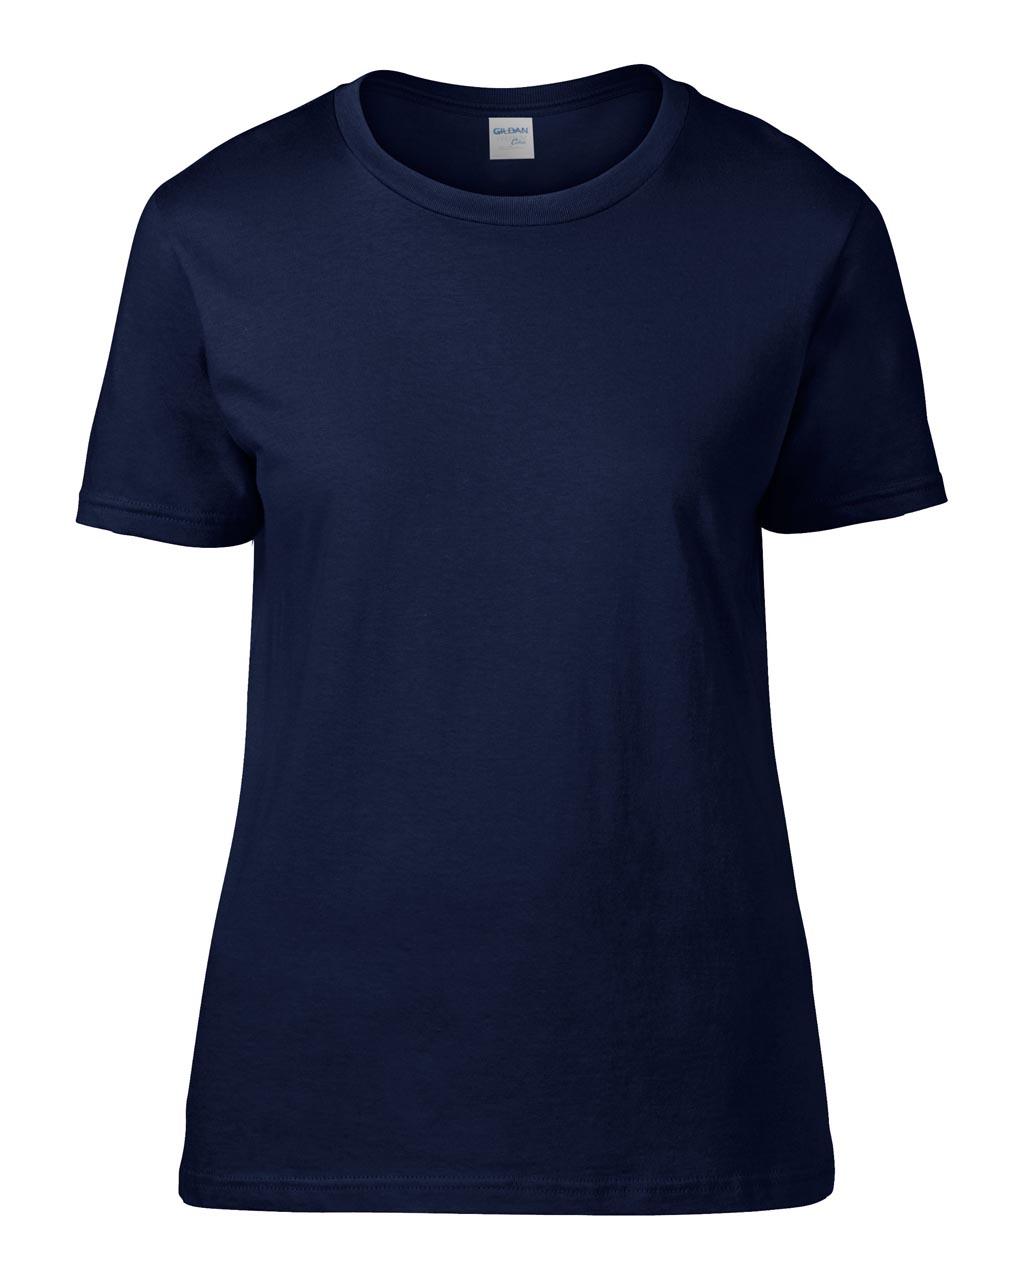 Tricou dama Gildan Premium Cotton bumbac 185 g/mp serigrafie termotransfer broderie DTG | Toroadv.ro